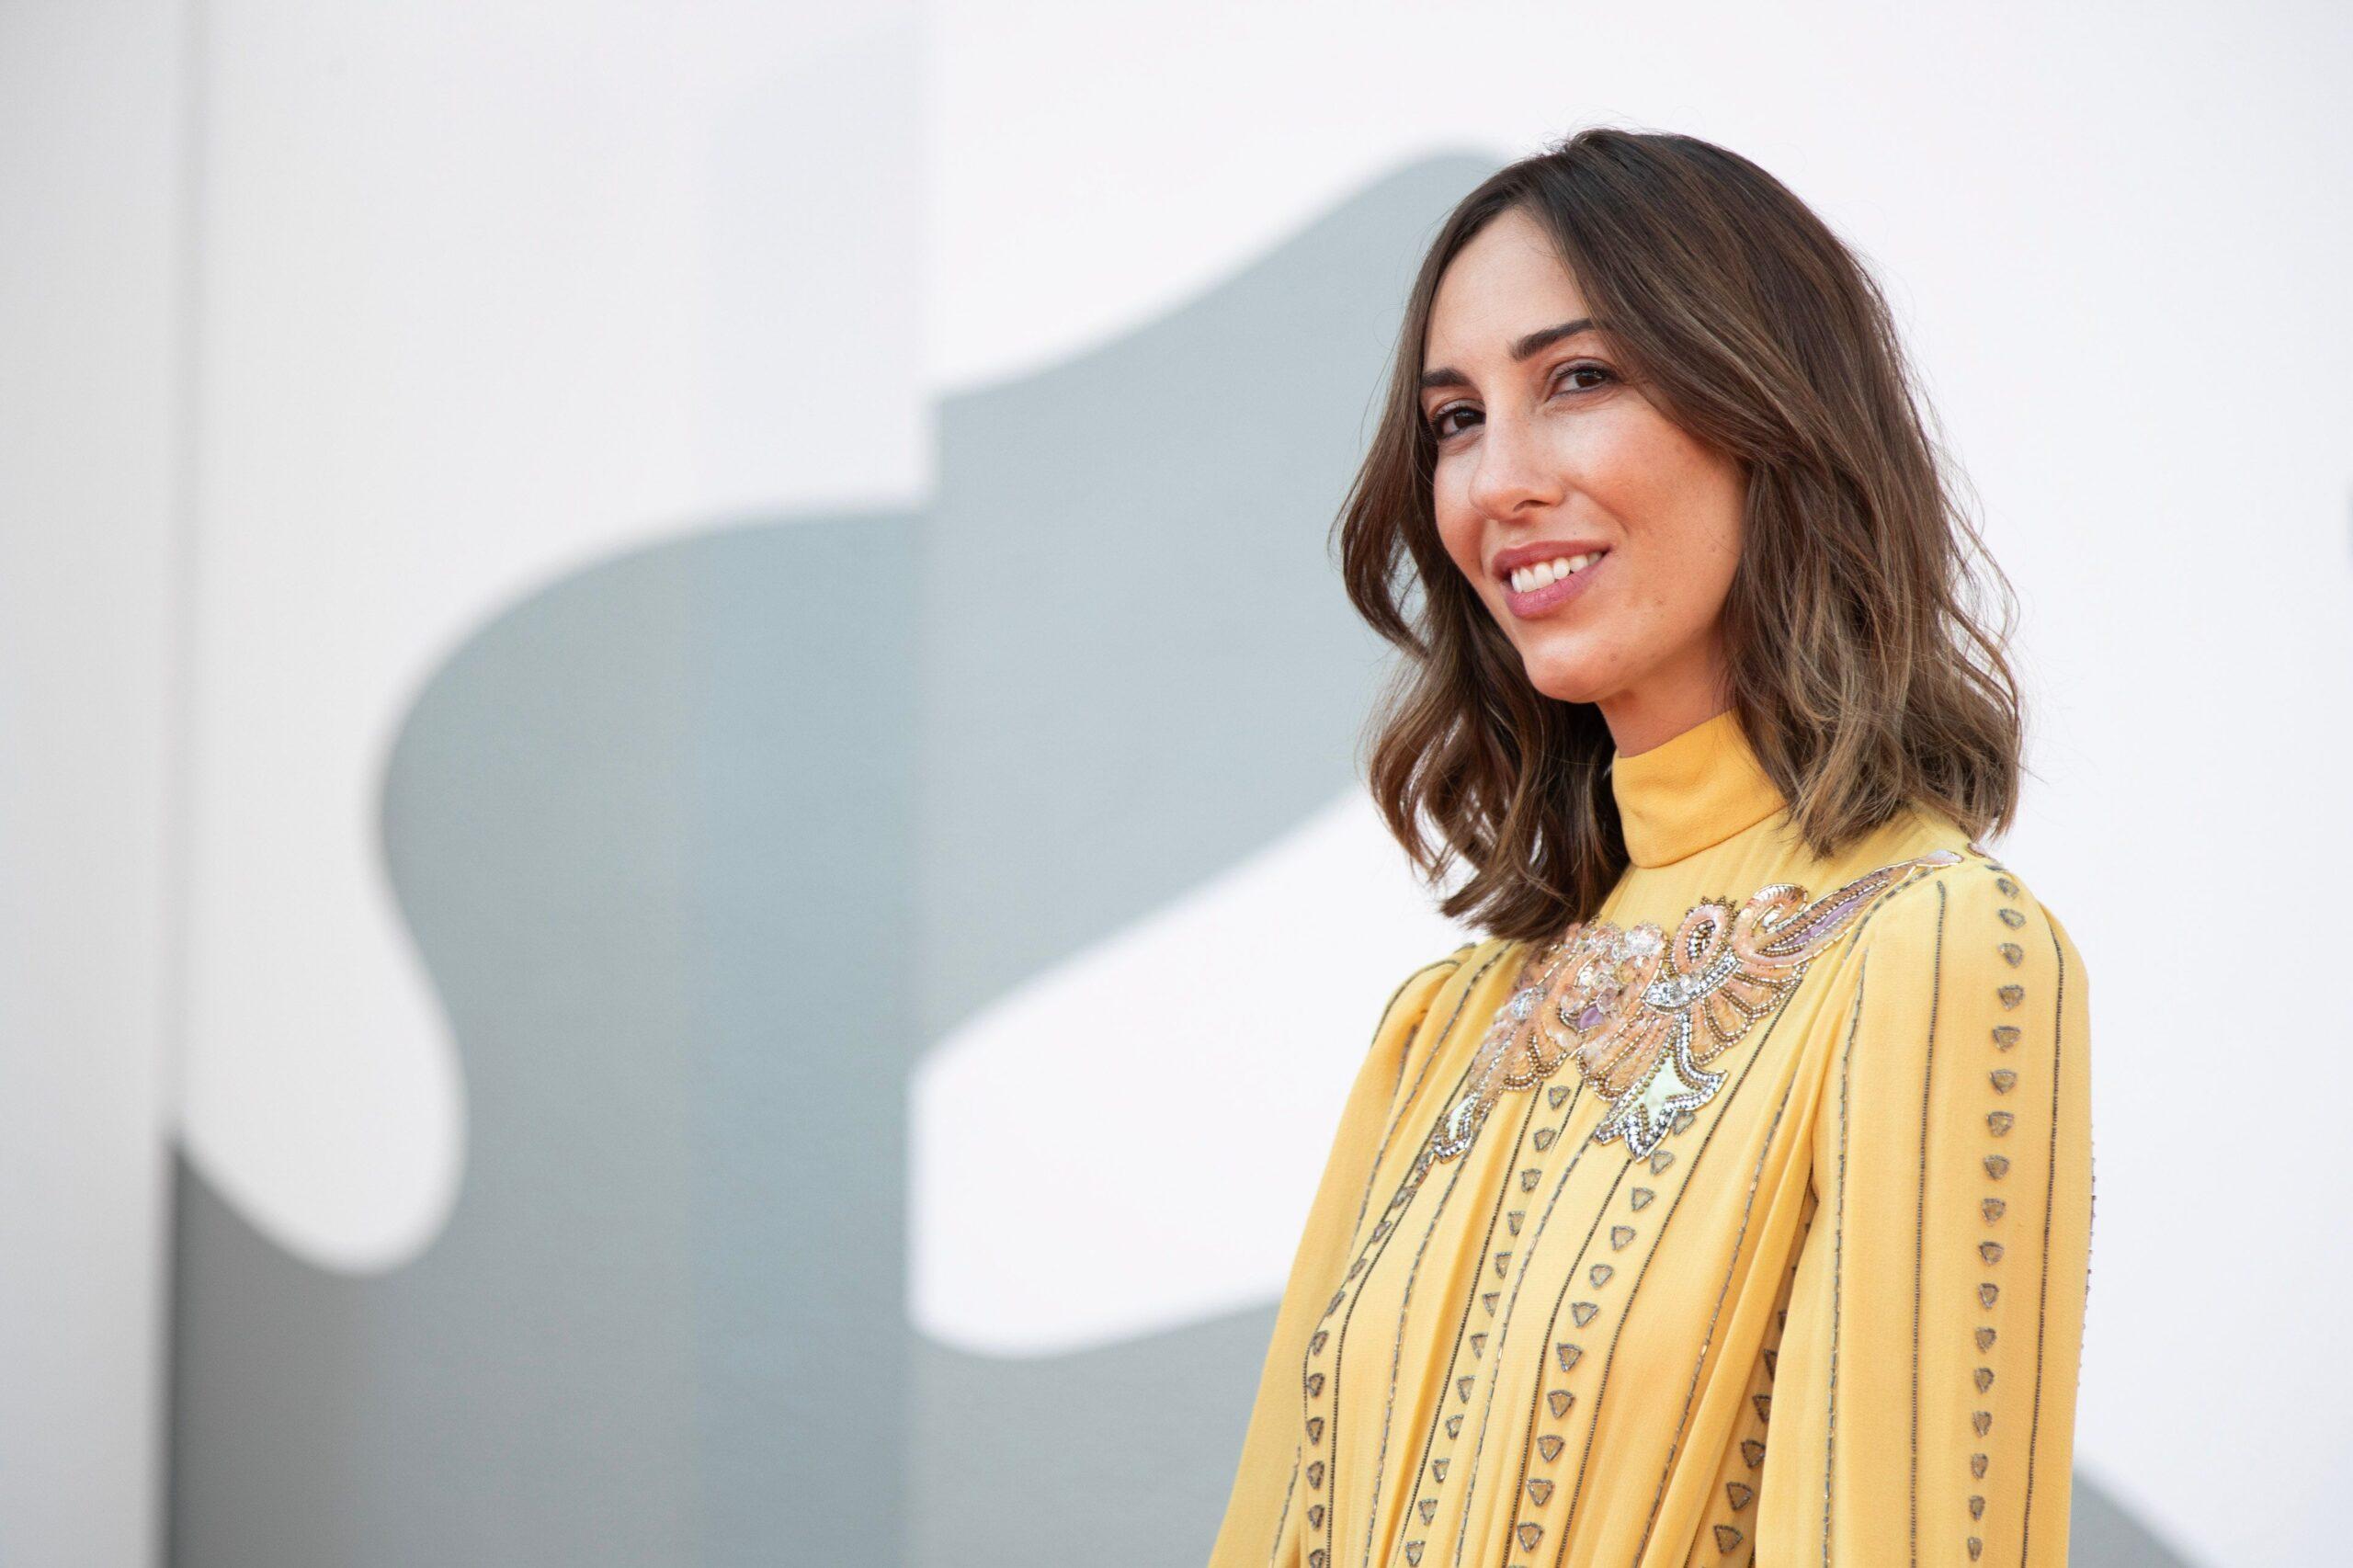 Maya Hawke & Gia Coppola Shine at the 2020 Venice Film Festival 5